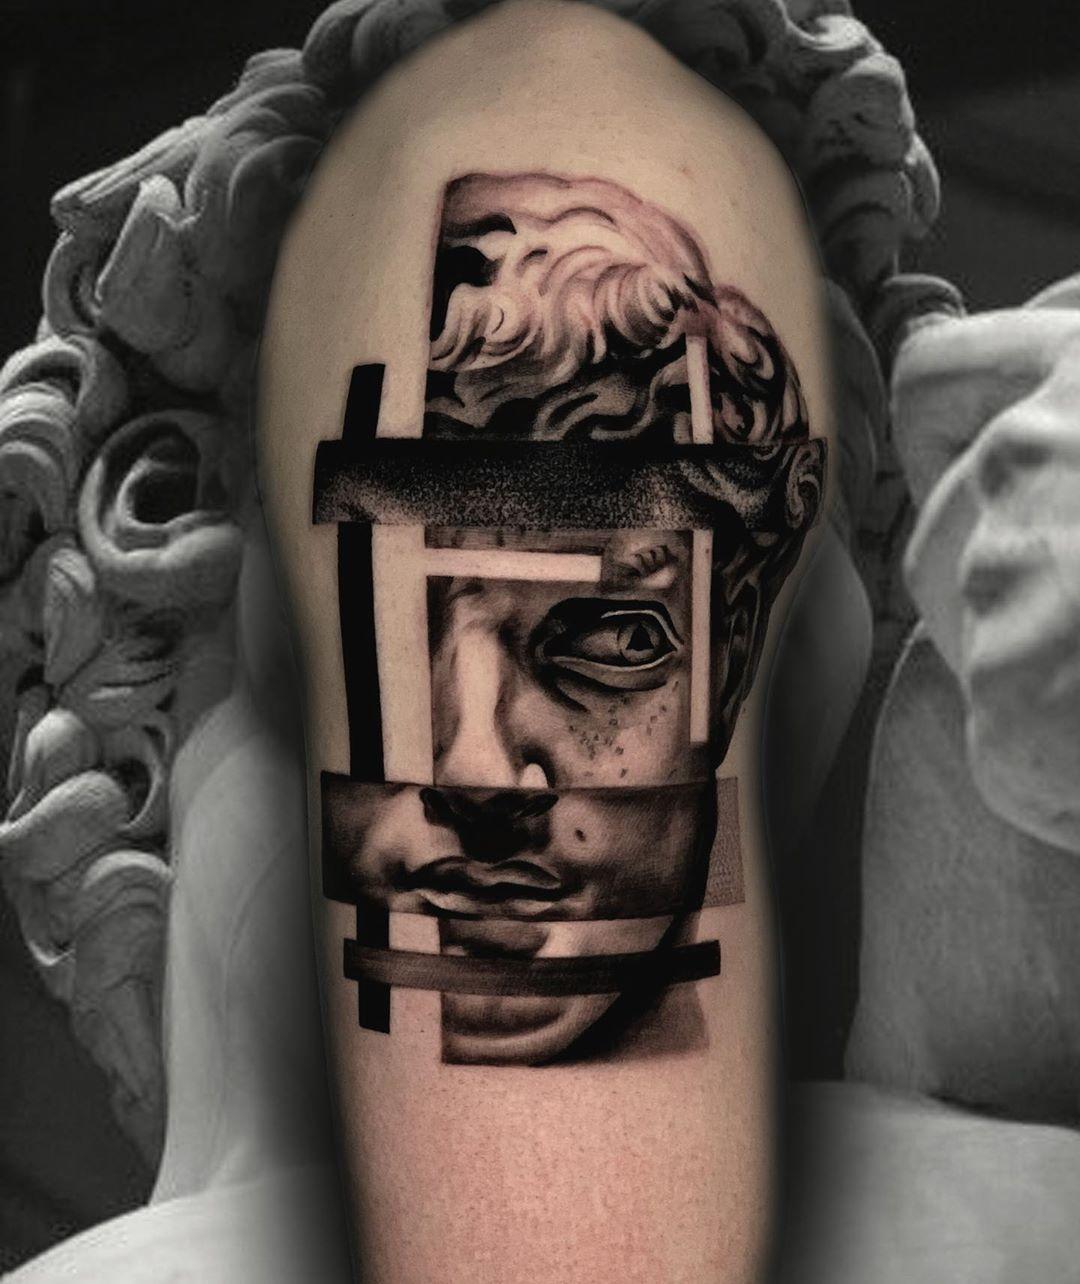 By @dom_tattooer  #tattoodefender #tattoodefenderteam #tattoodefenderaftercare #tattooink #tatuati #tatuatori #loveyourskin #movesafe #tattooart #tattoos #tat #tattooing #realistic #realistictattoo #tattoorealistic #realistictattoos #realisticink #ink #inktattoo